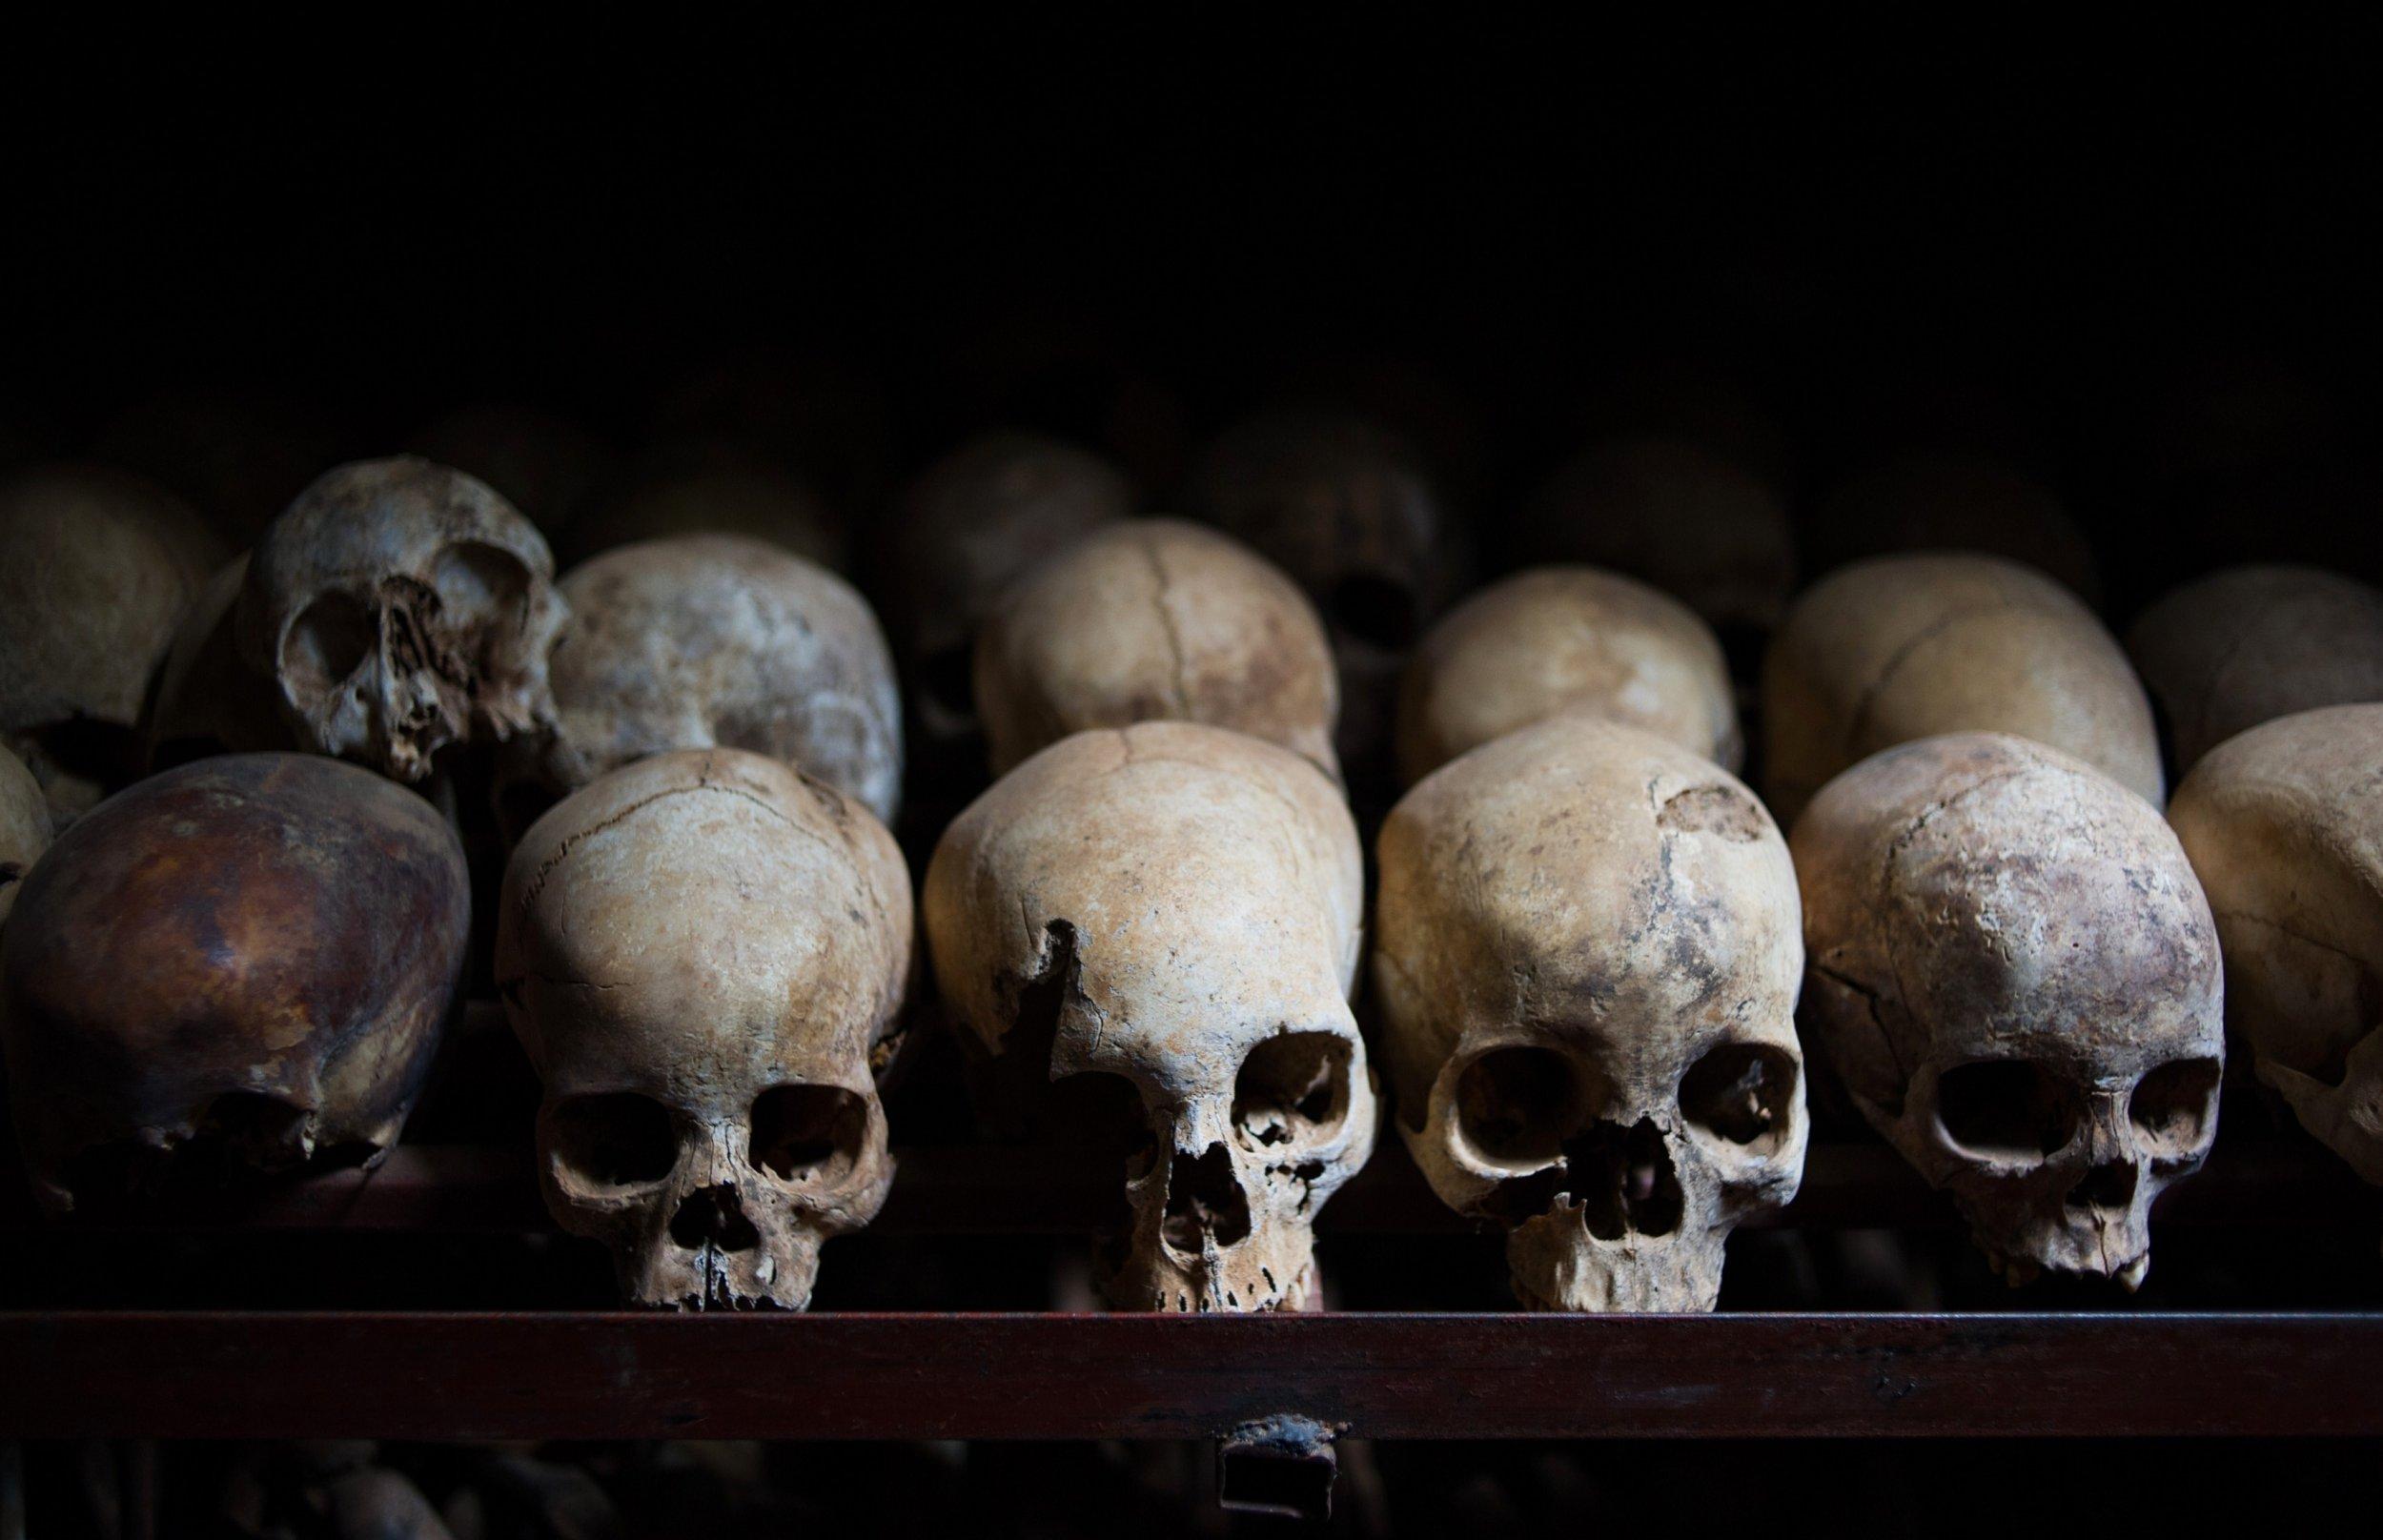 Rwandan genocide victims skulls